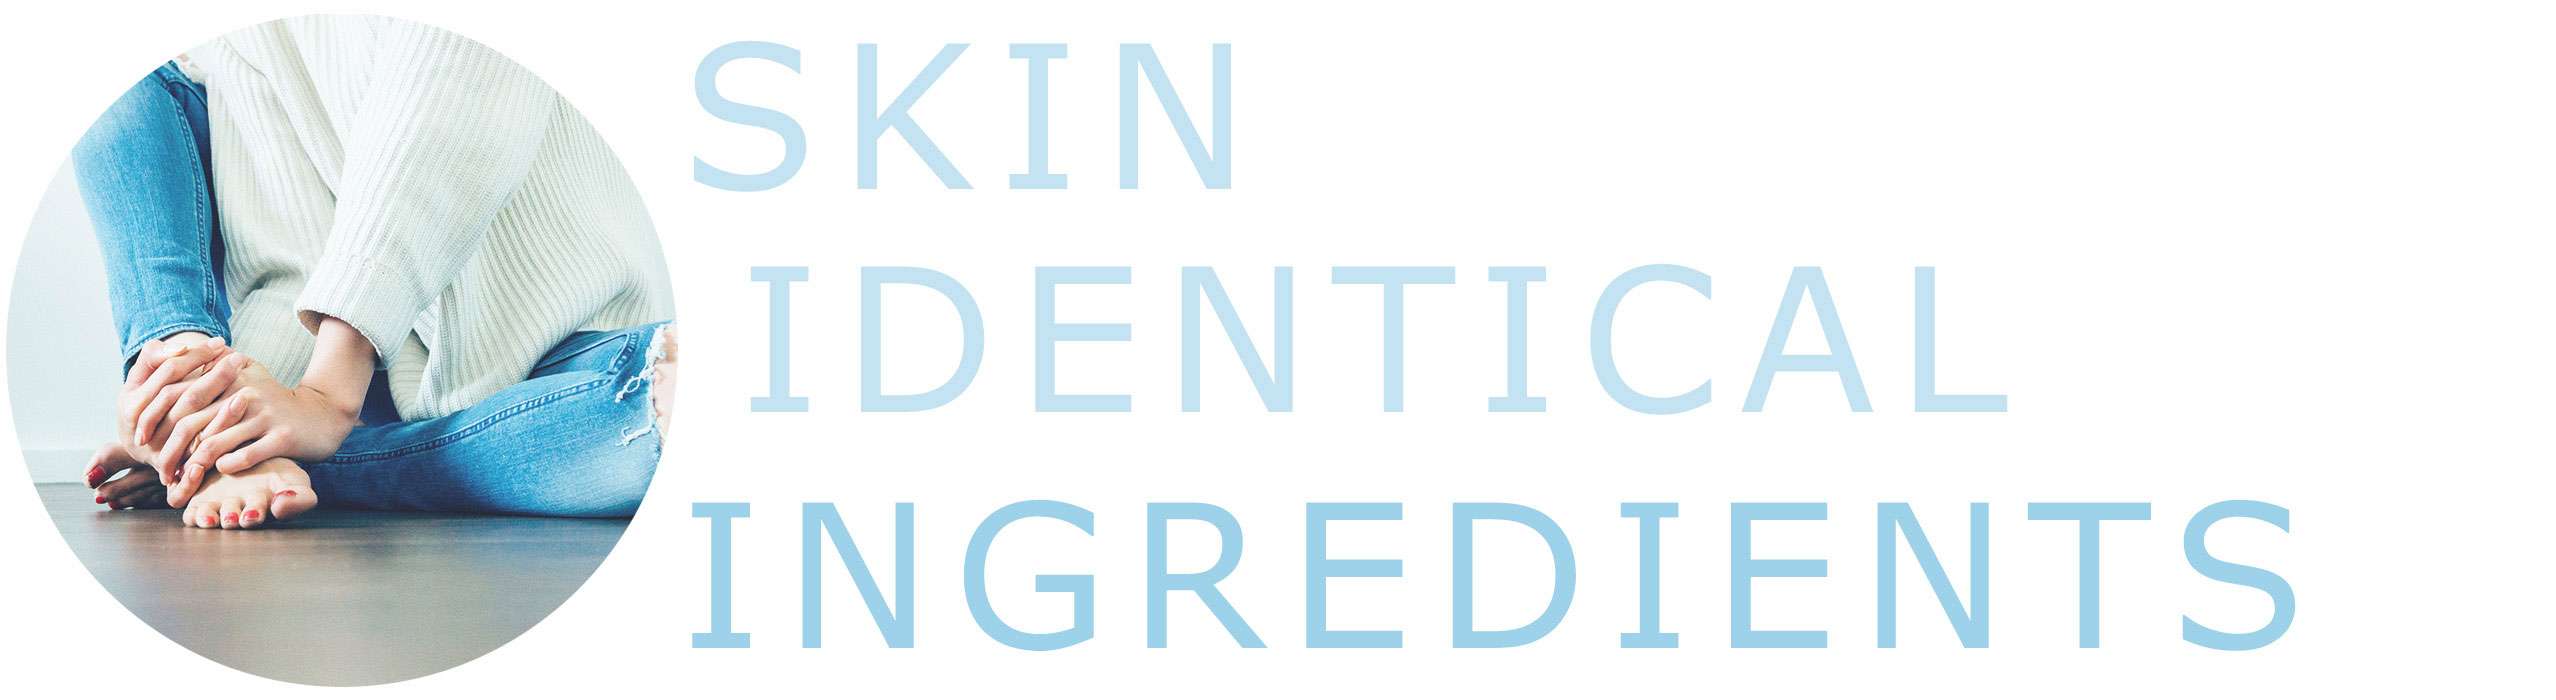 The 3 key skin identical ingredients.